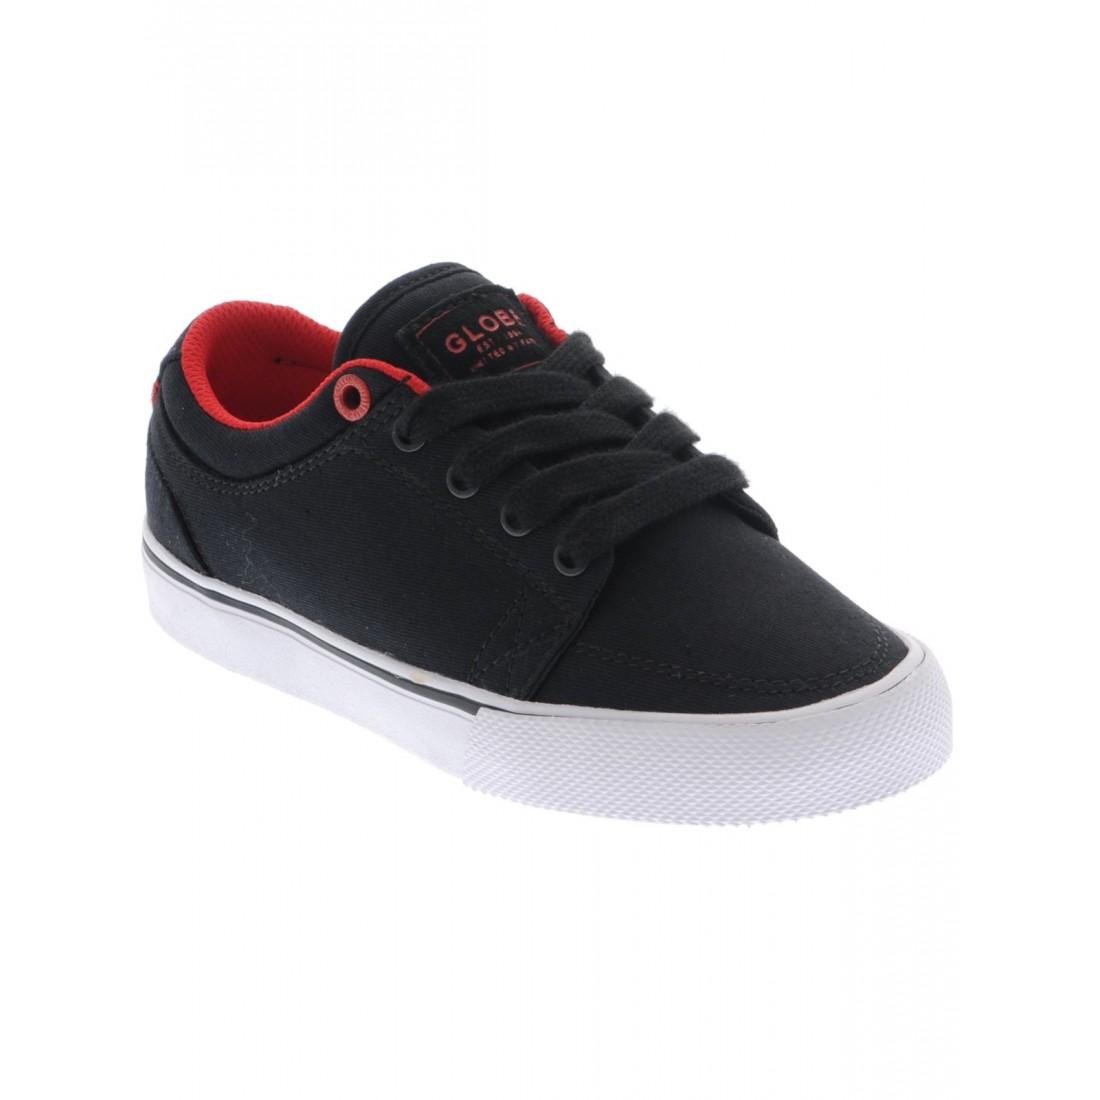 GS black red